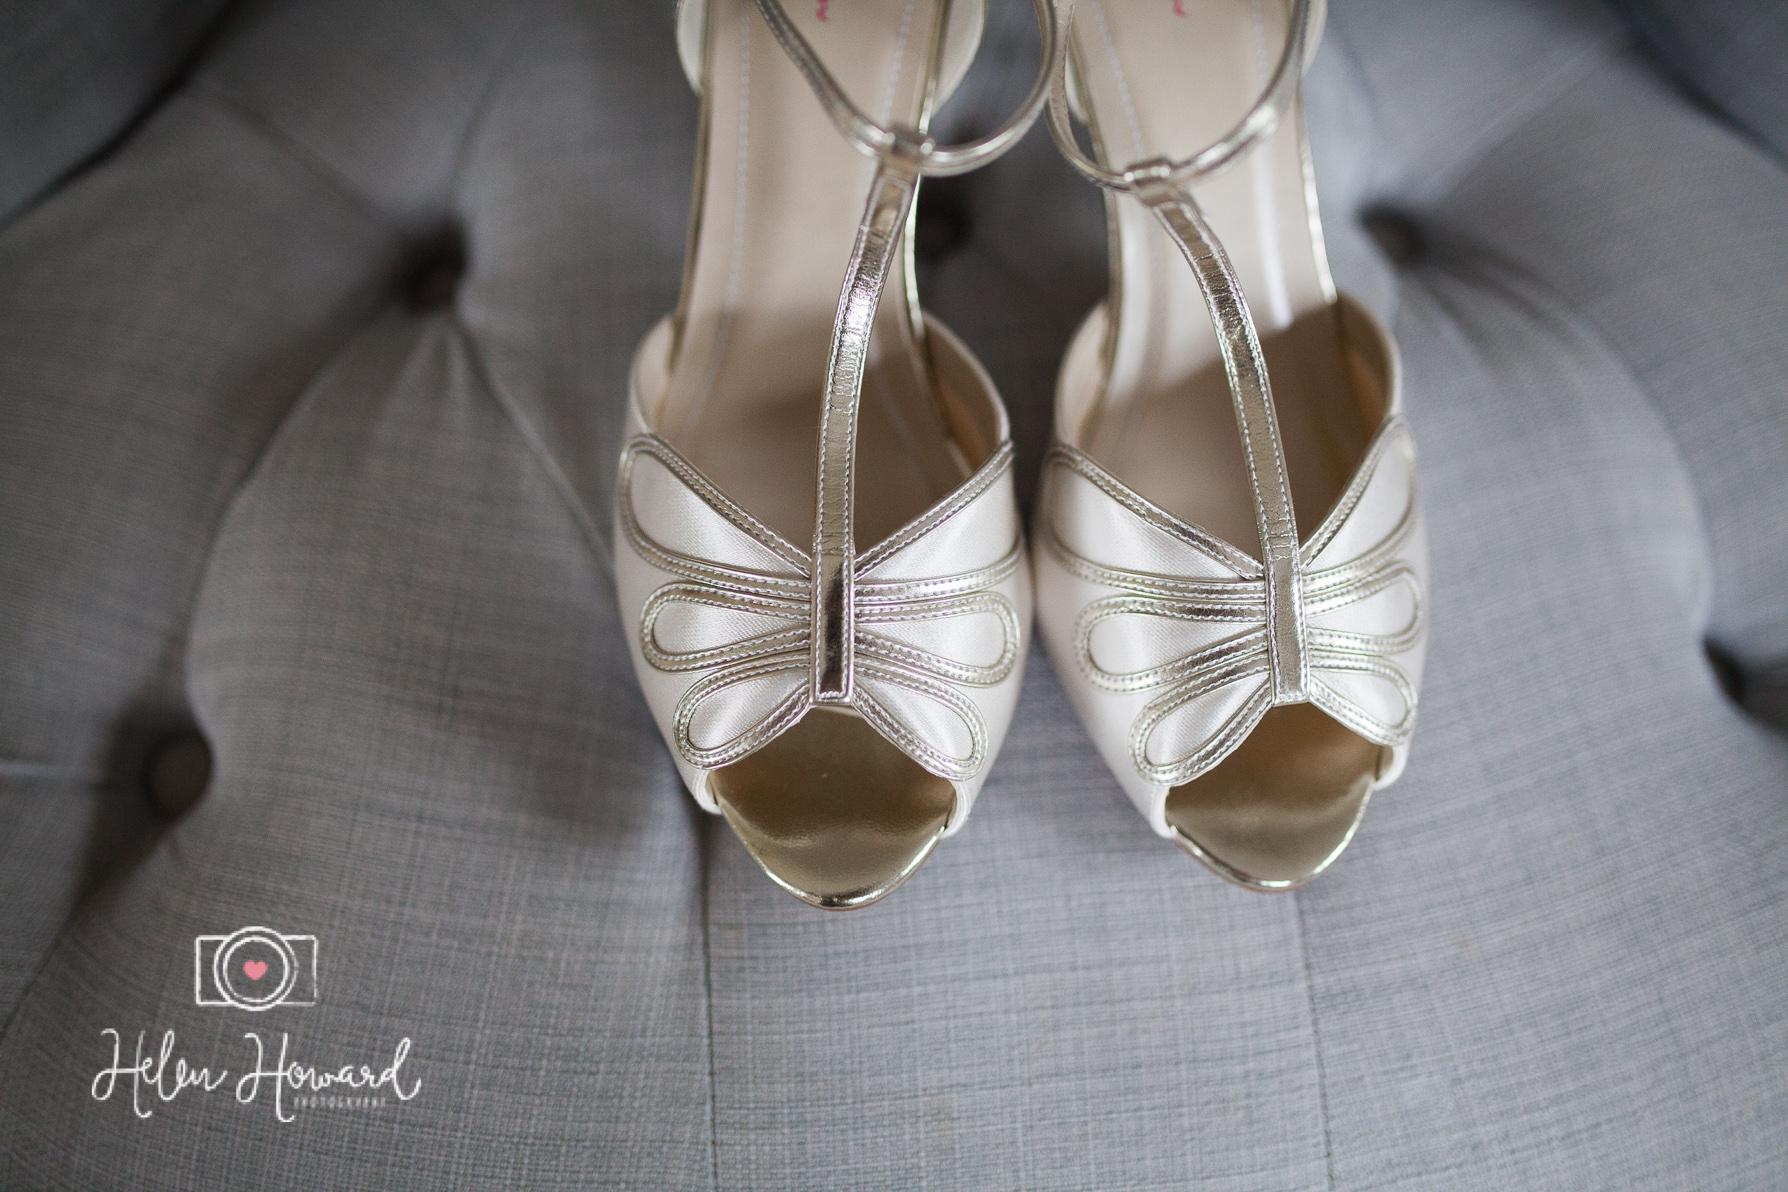 Helen Howard Photography Packington Moor Wedding-10.jpg